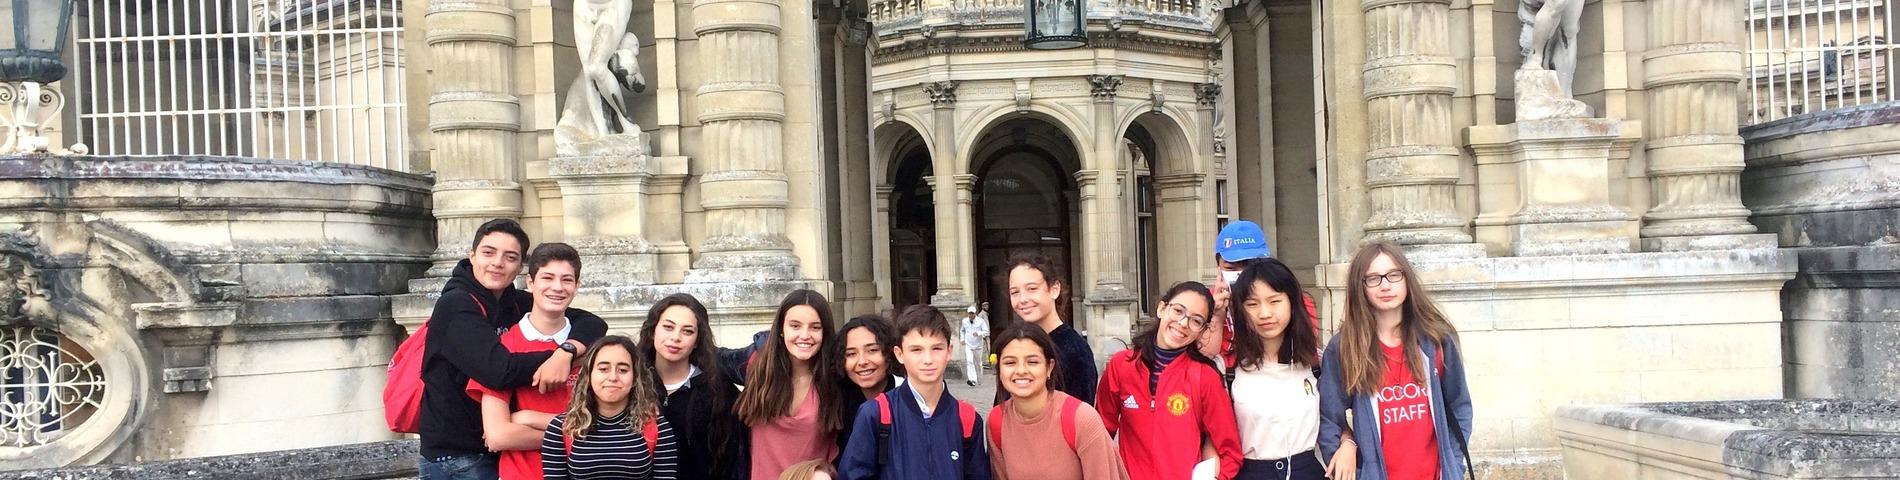 Imatge 1 de l'escola Accord French Language School